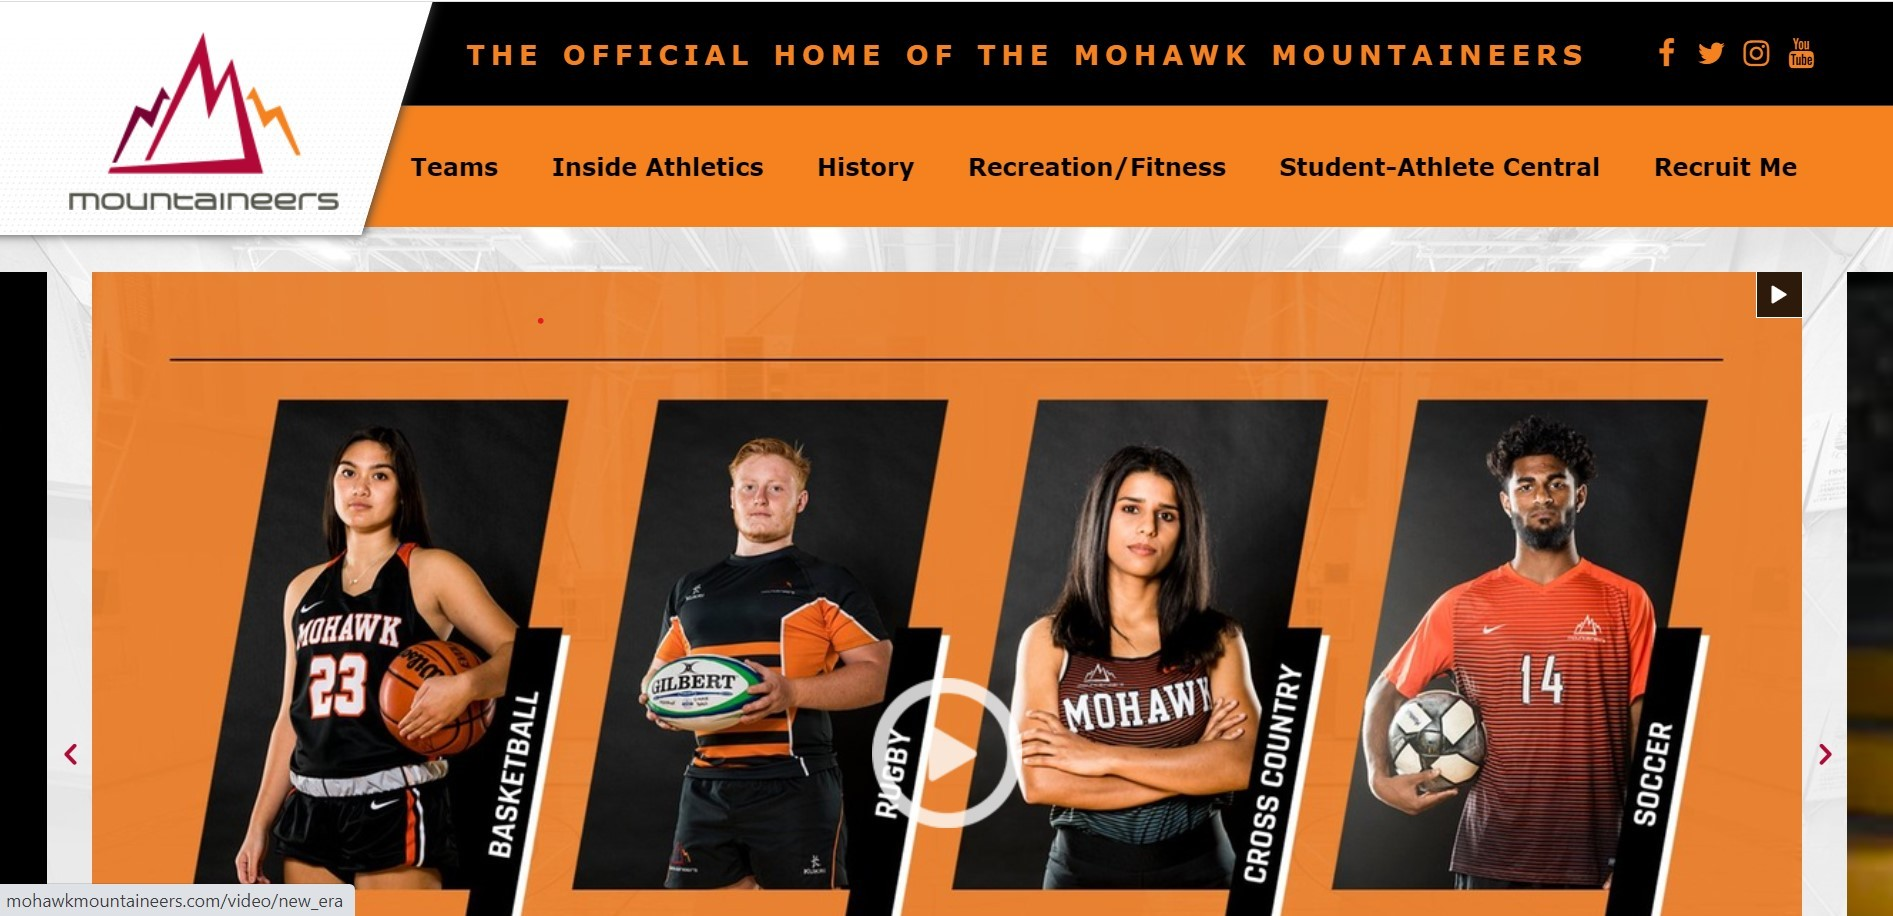 Mohawk Mountaineers website landing page